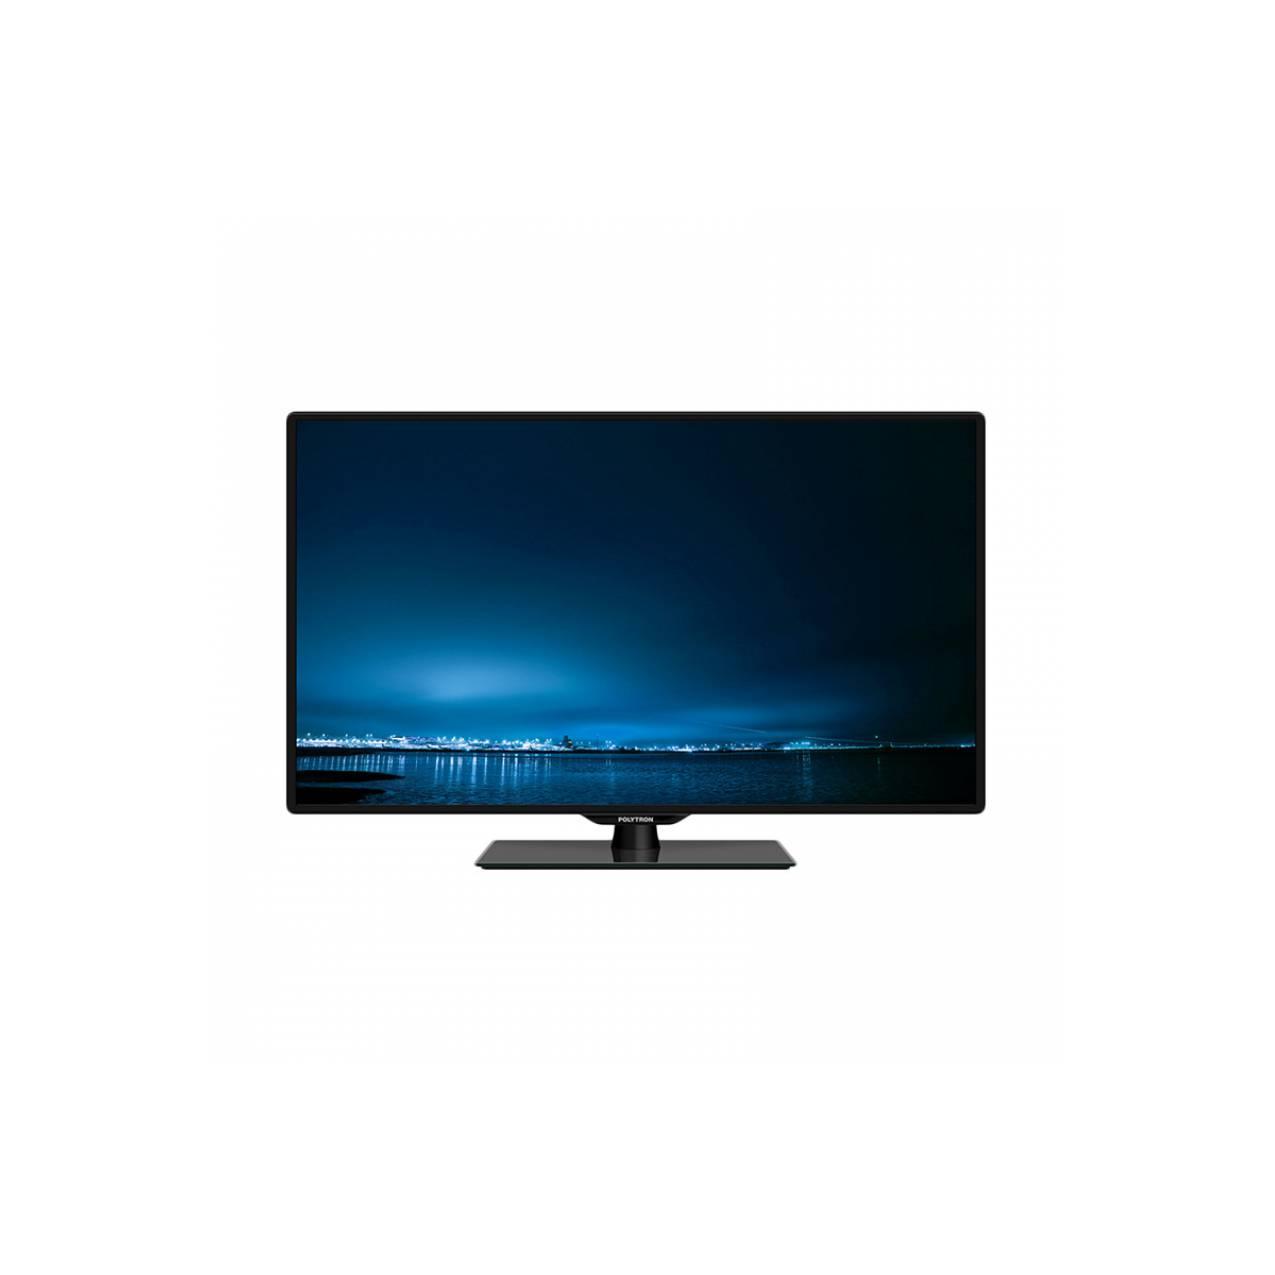 POLYTRON Digital PLD 40V853 LED TV [39 Inch]